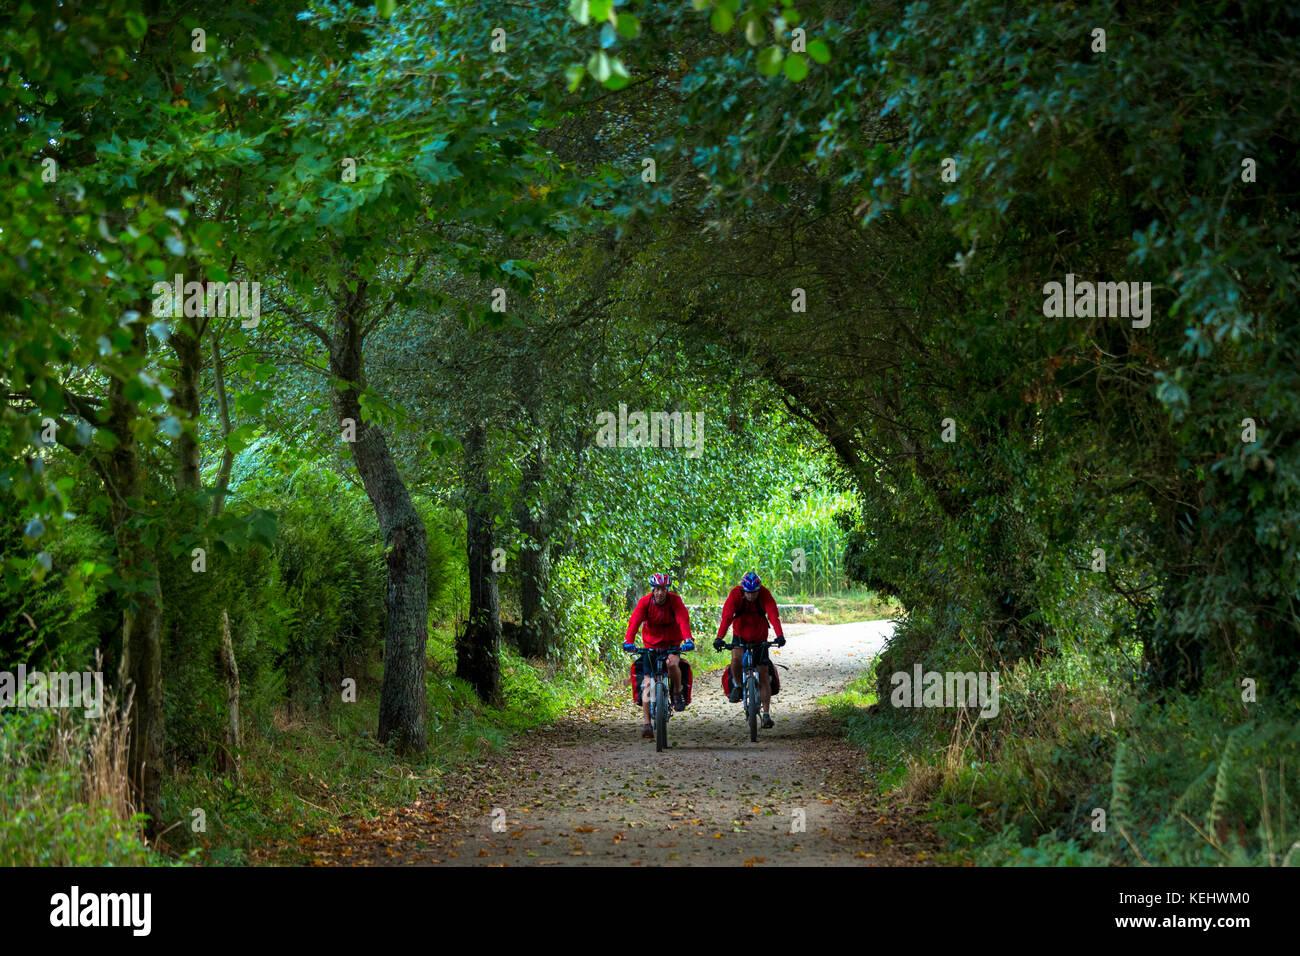 Cyclists on the Camino de Santiago Pilgrim's route to Santiago de Compostela in Galicia, Spain - Stock Image